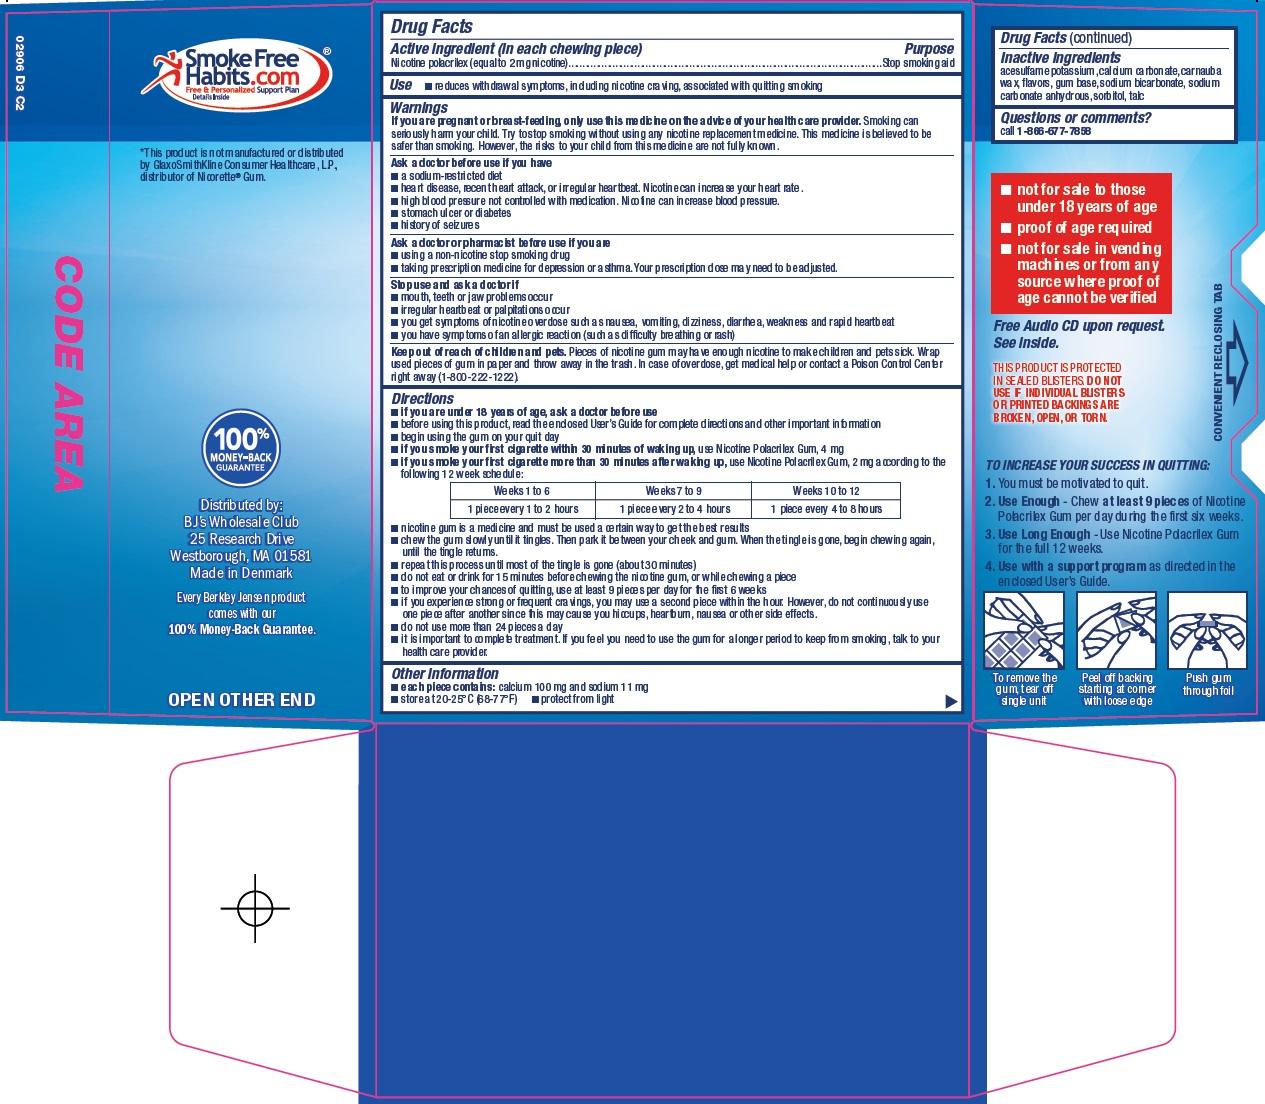 029d3-nicotine-gum-carton-image-2